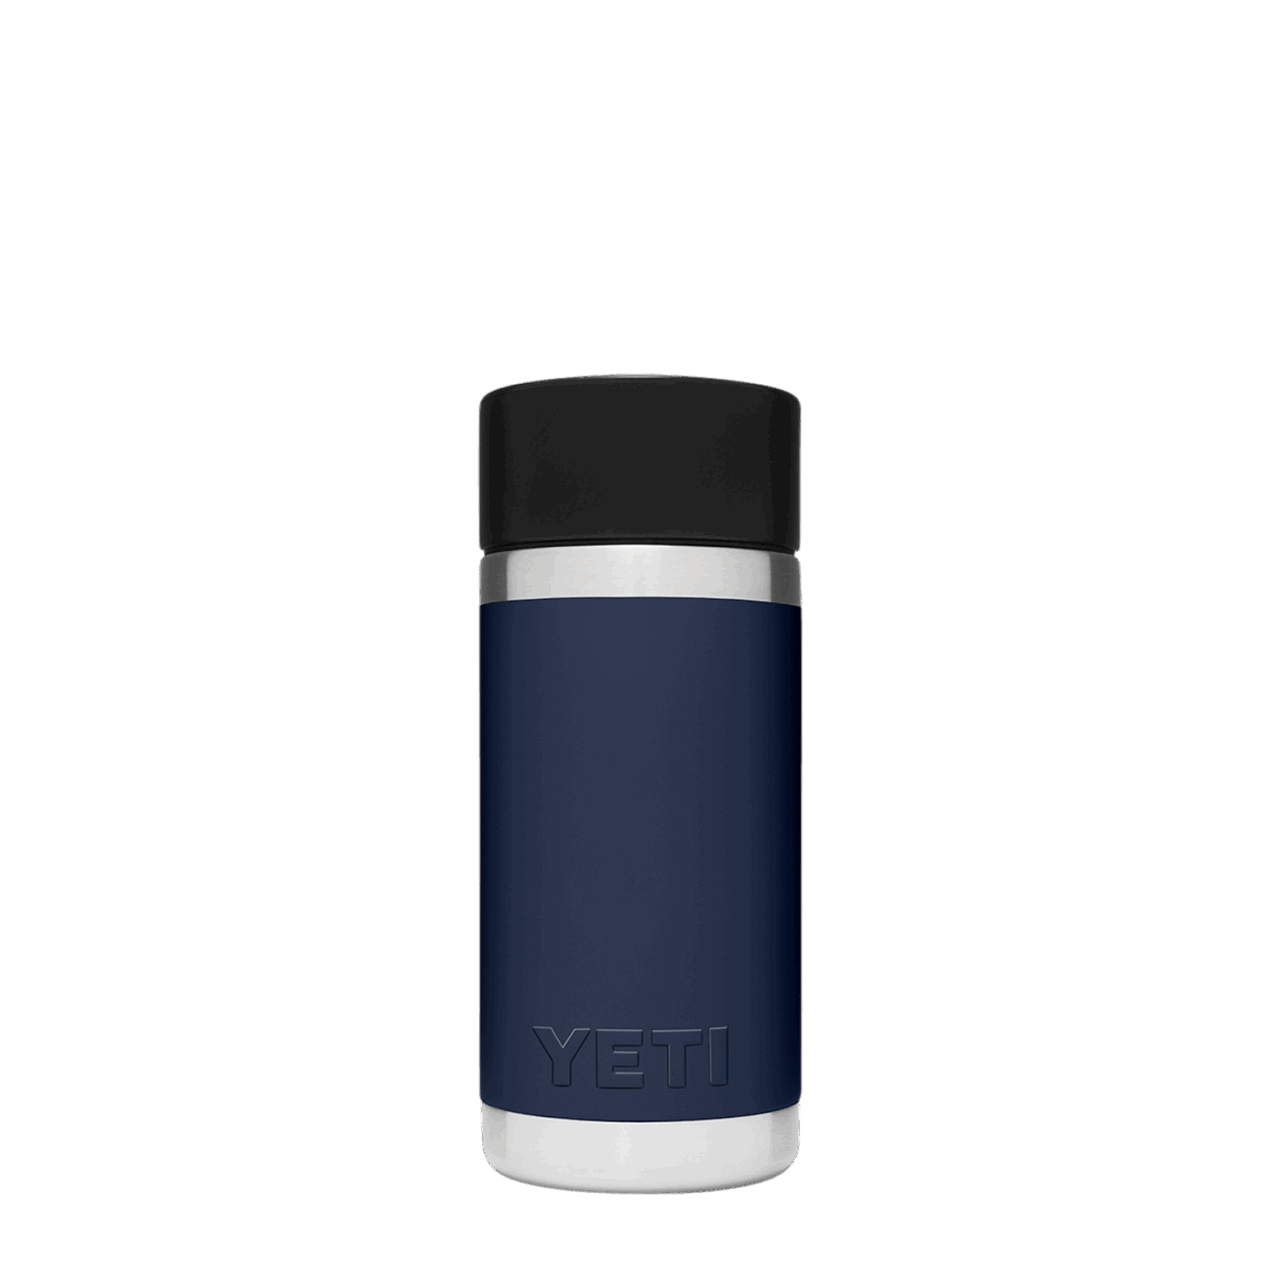 YETI Rambler 12oz Flasche - navy